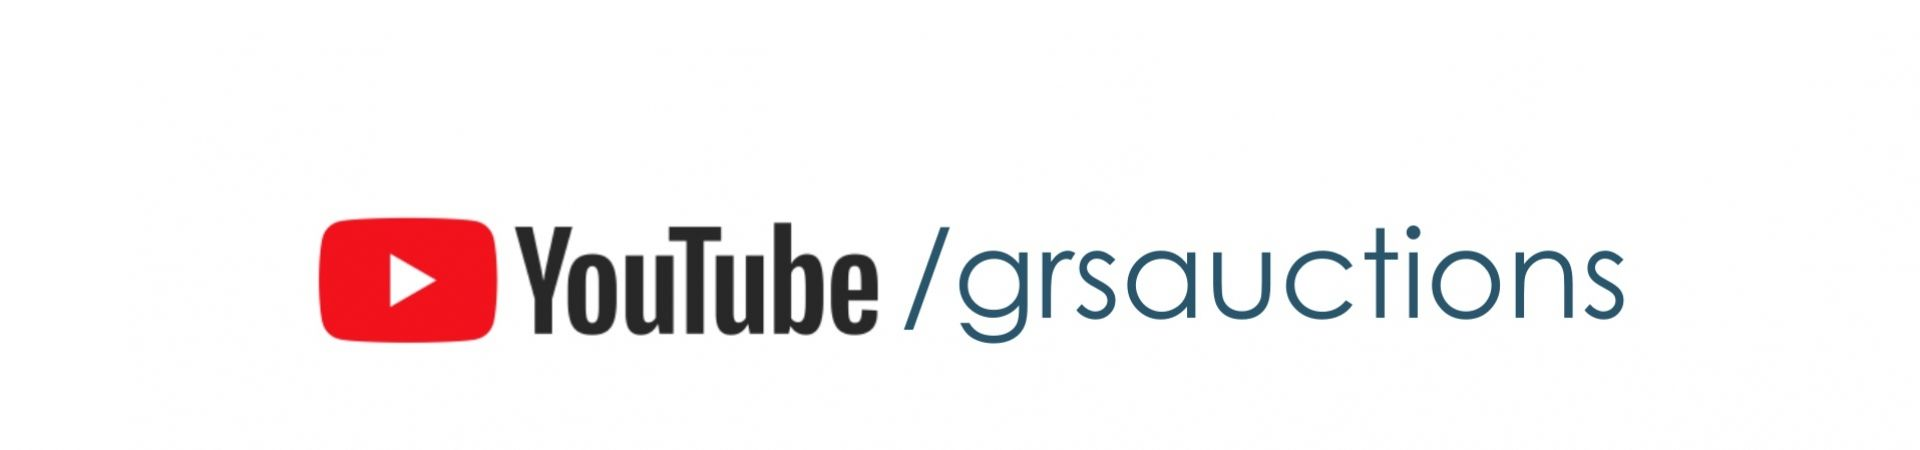 Youtube website cover